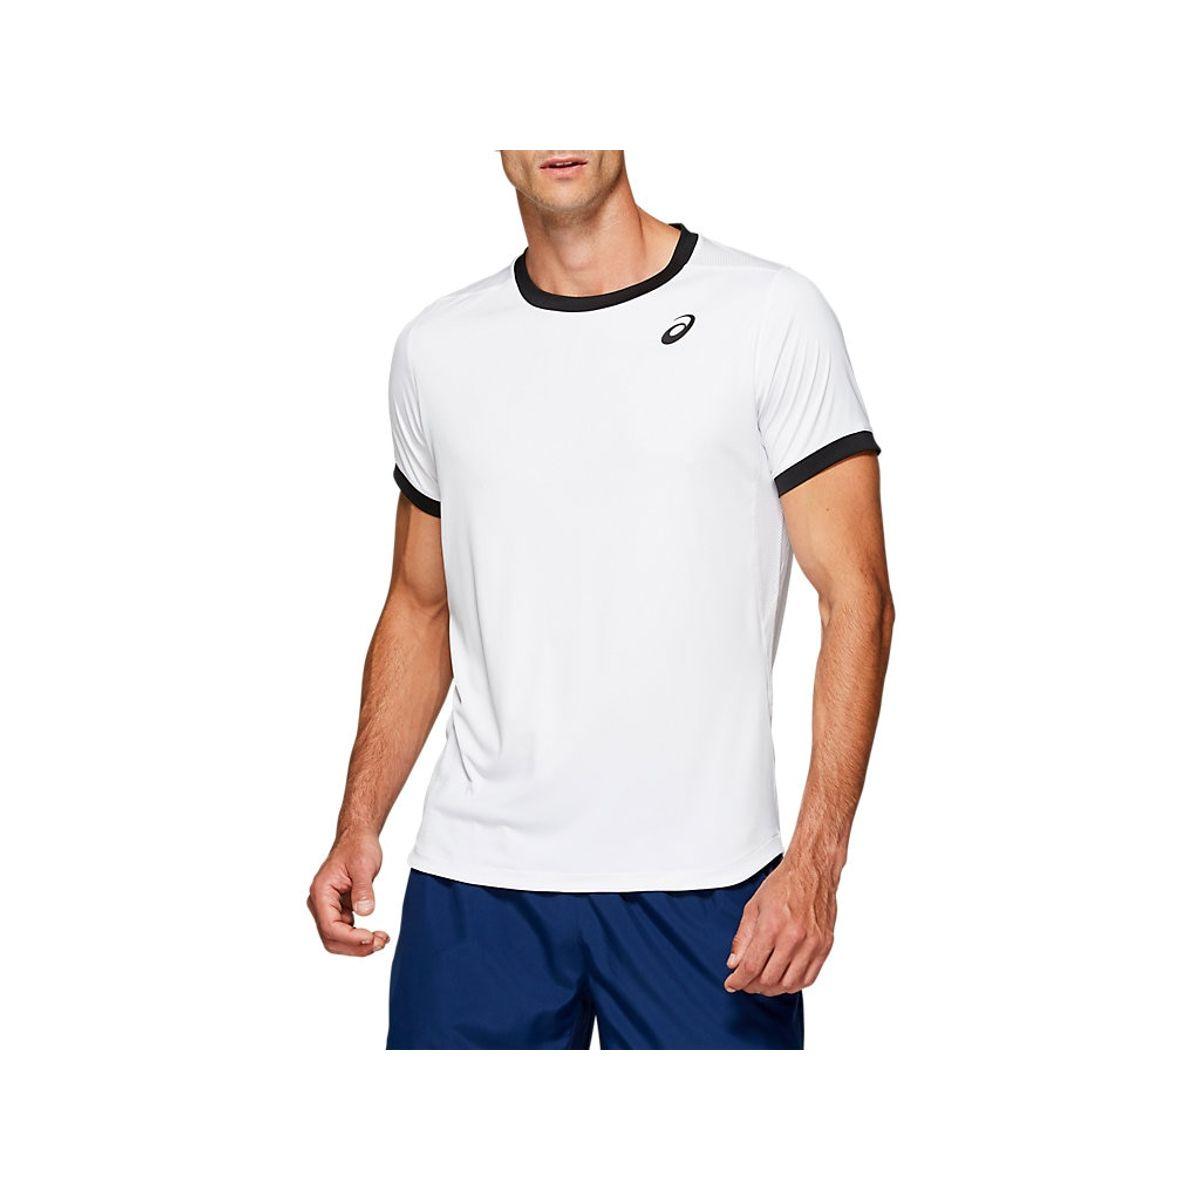 Camiseta-Asics-Club-com-Mangas-Curtas---Feminino---Branco